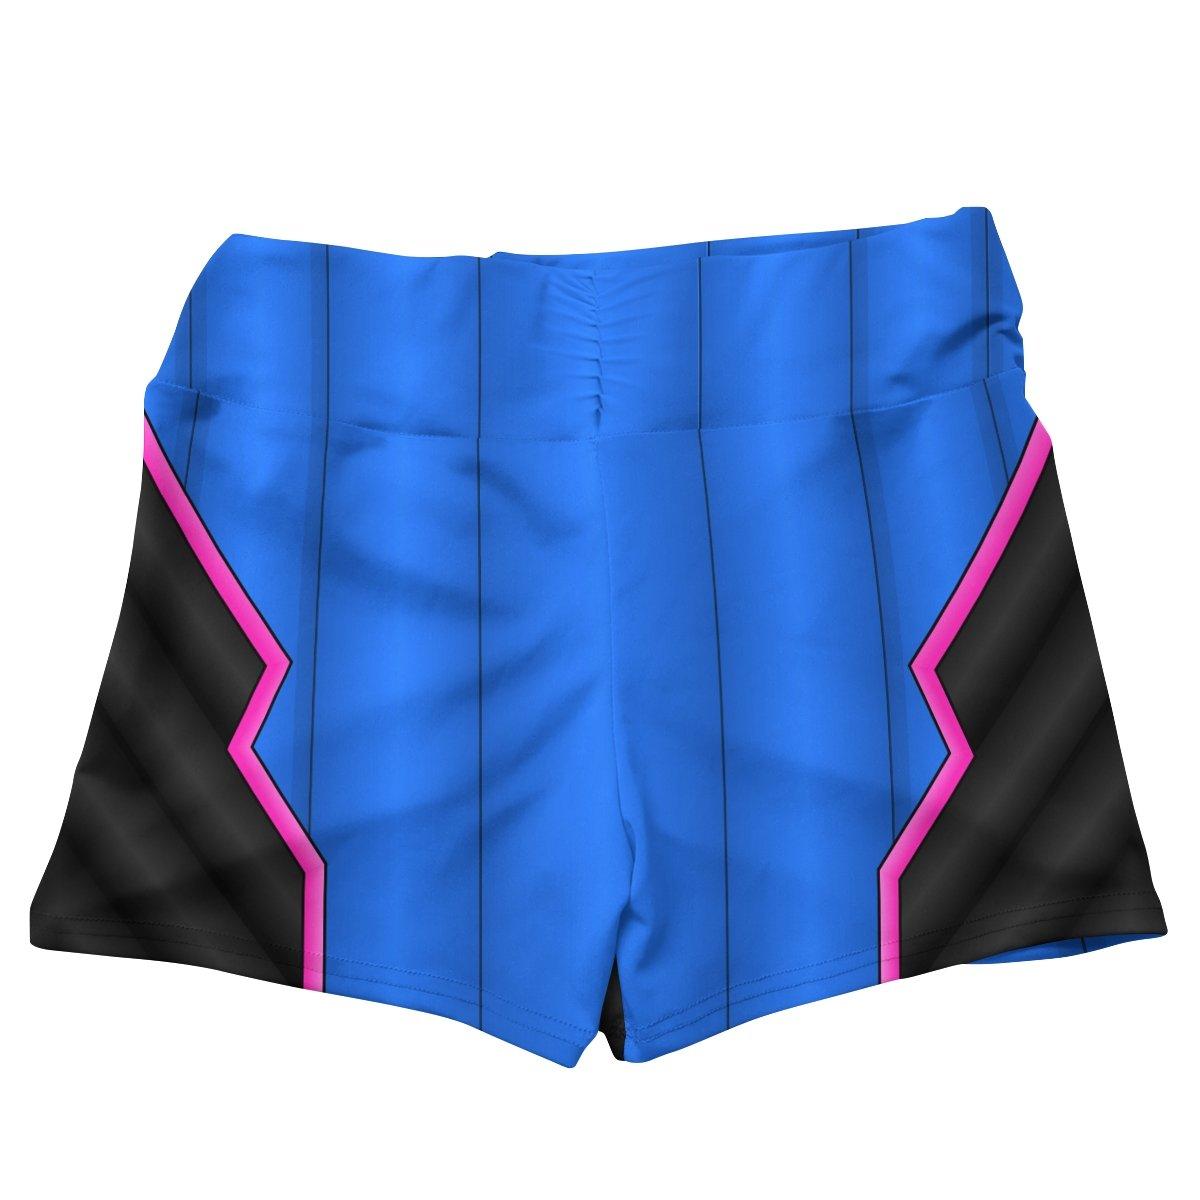 dva summer active wear set 180741 - Anime Swimsuits